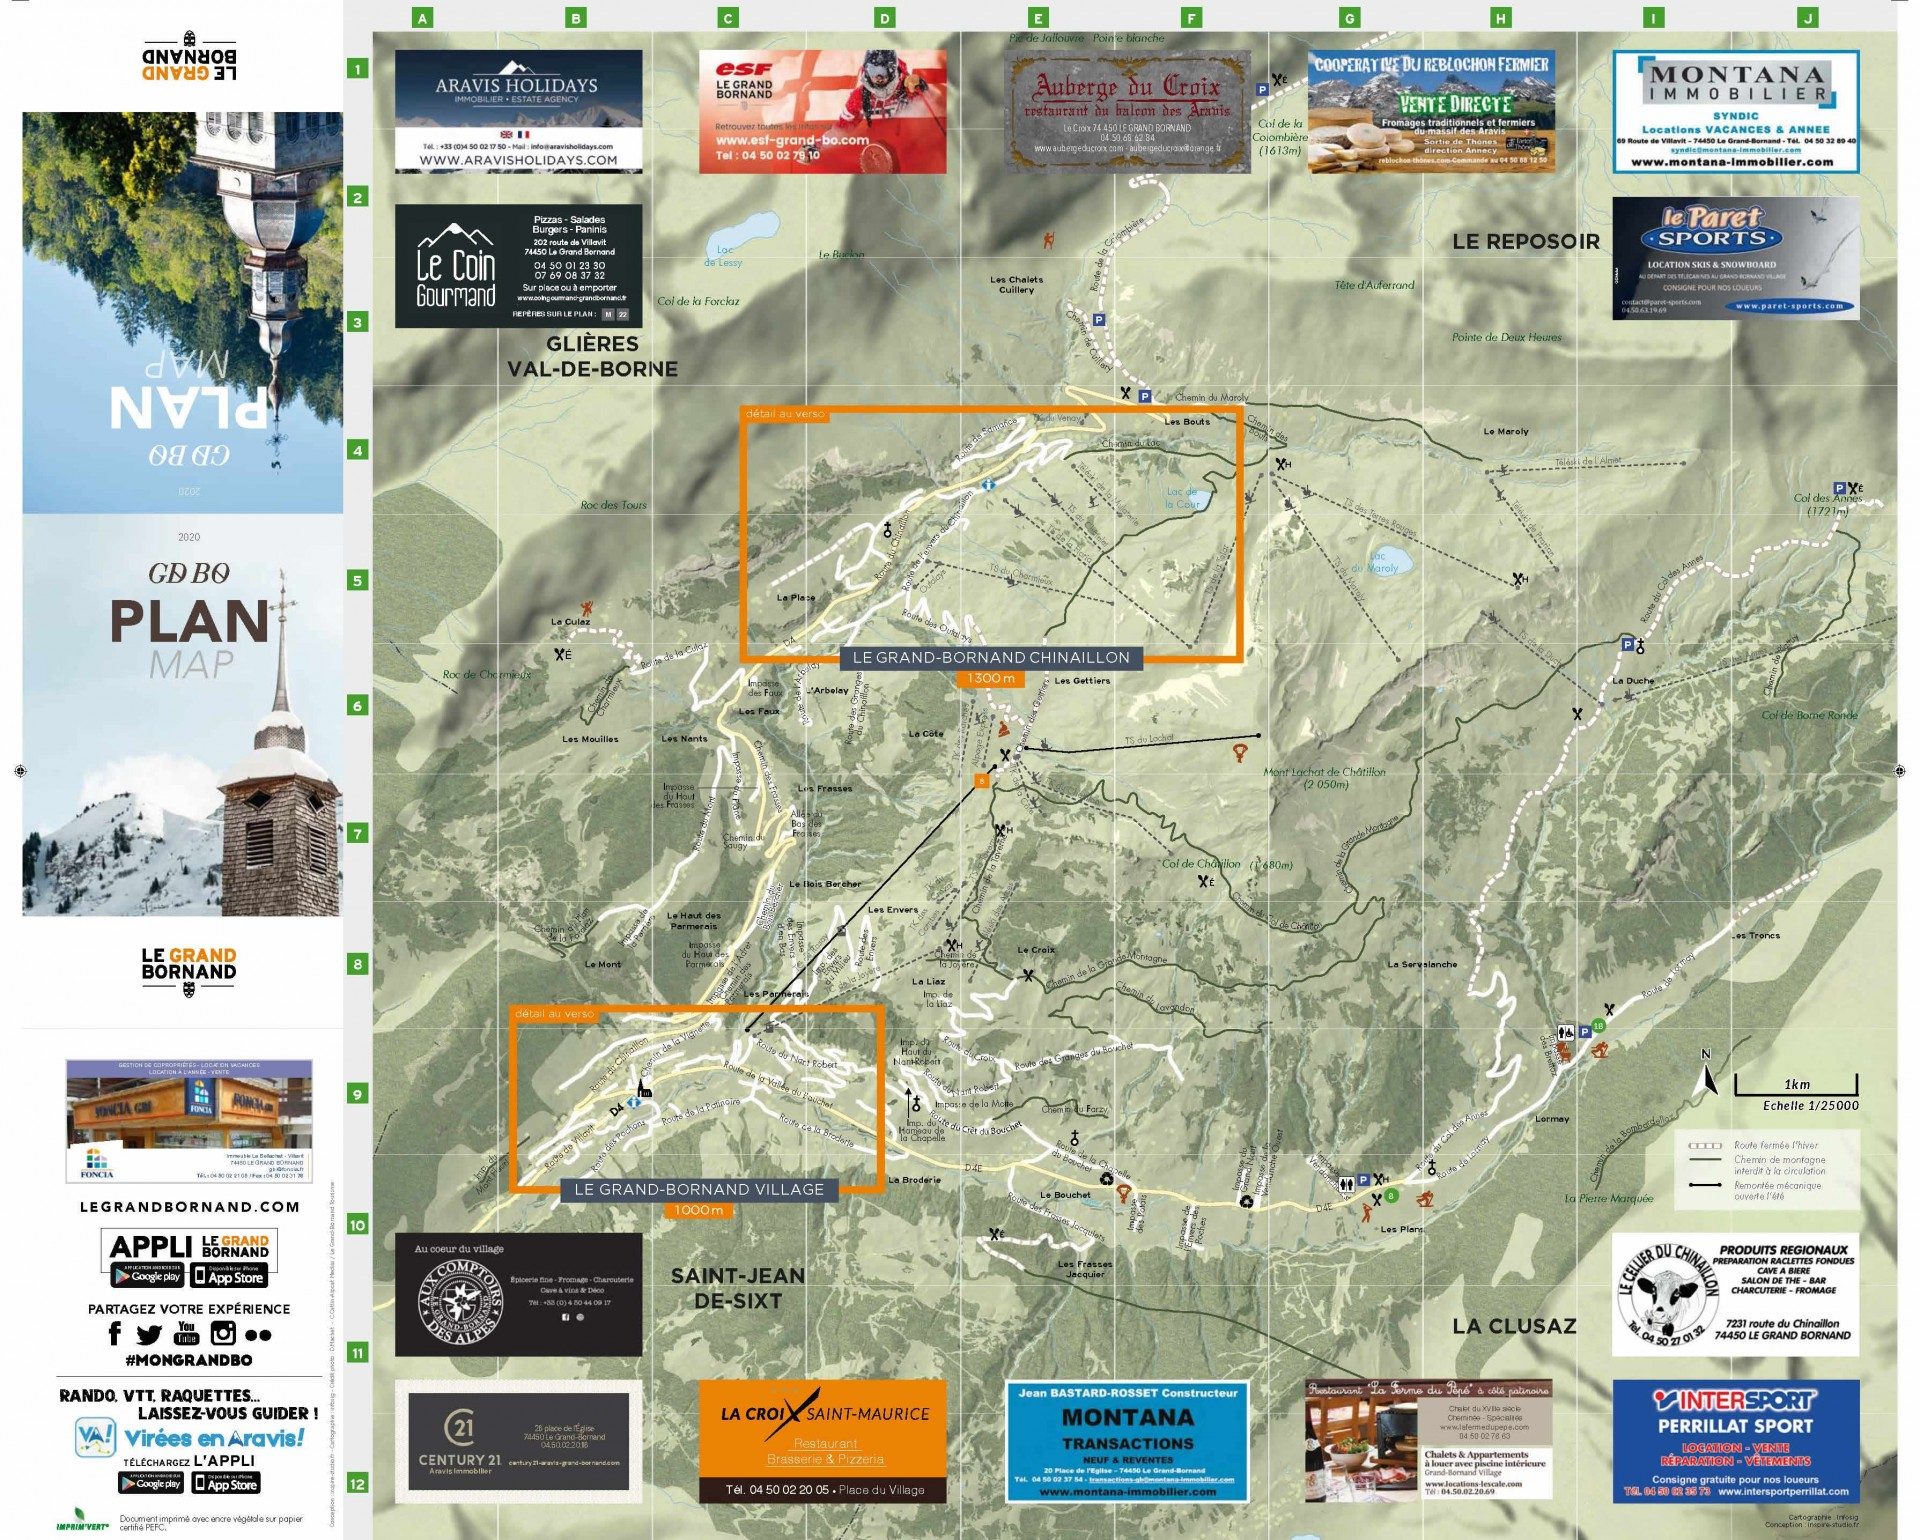 Plan général du Grand-Bornand